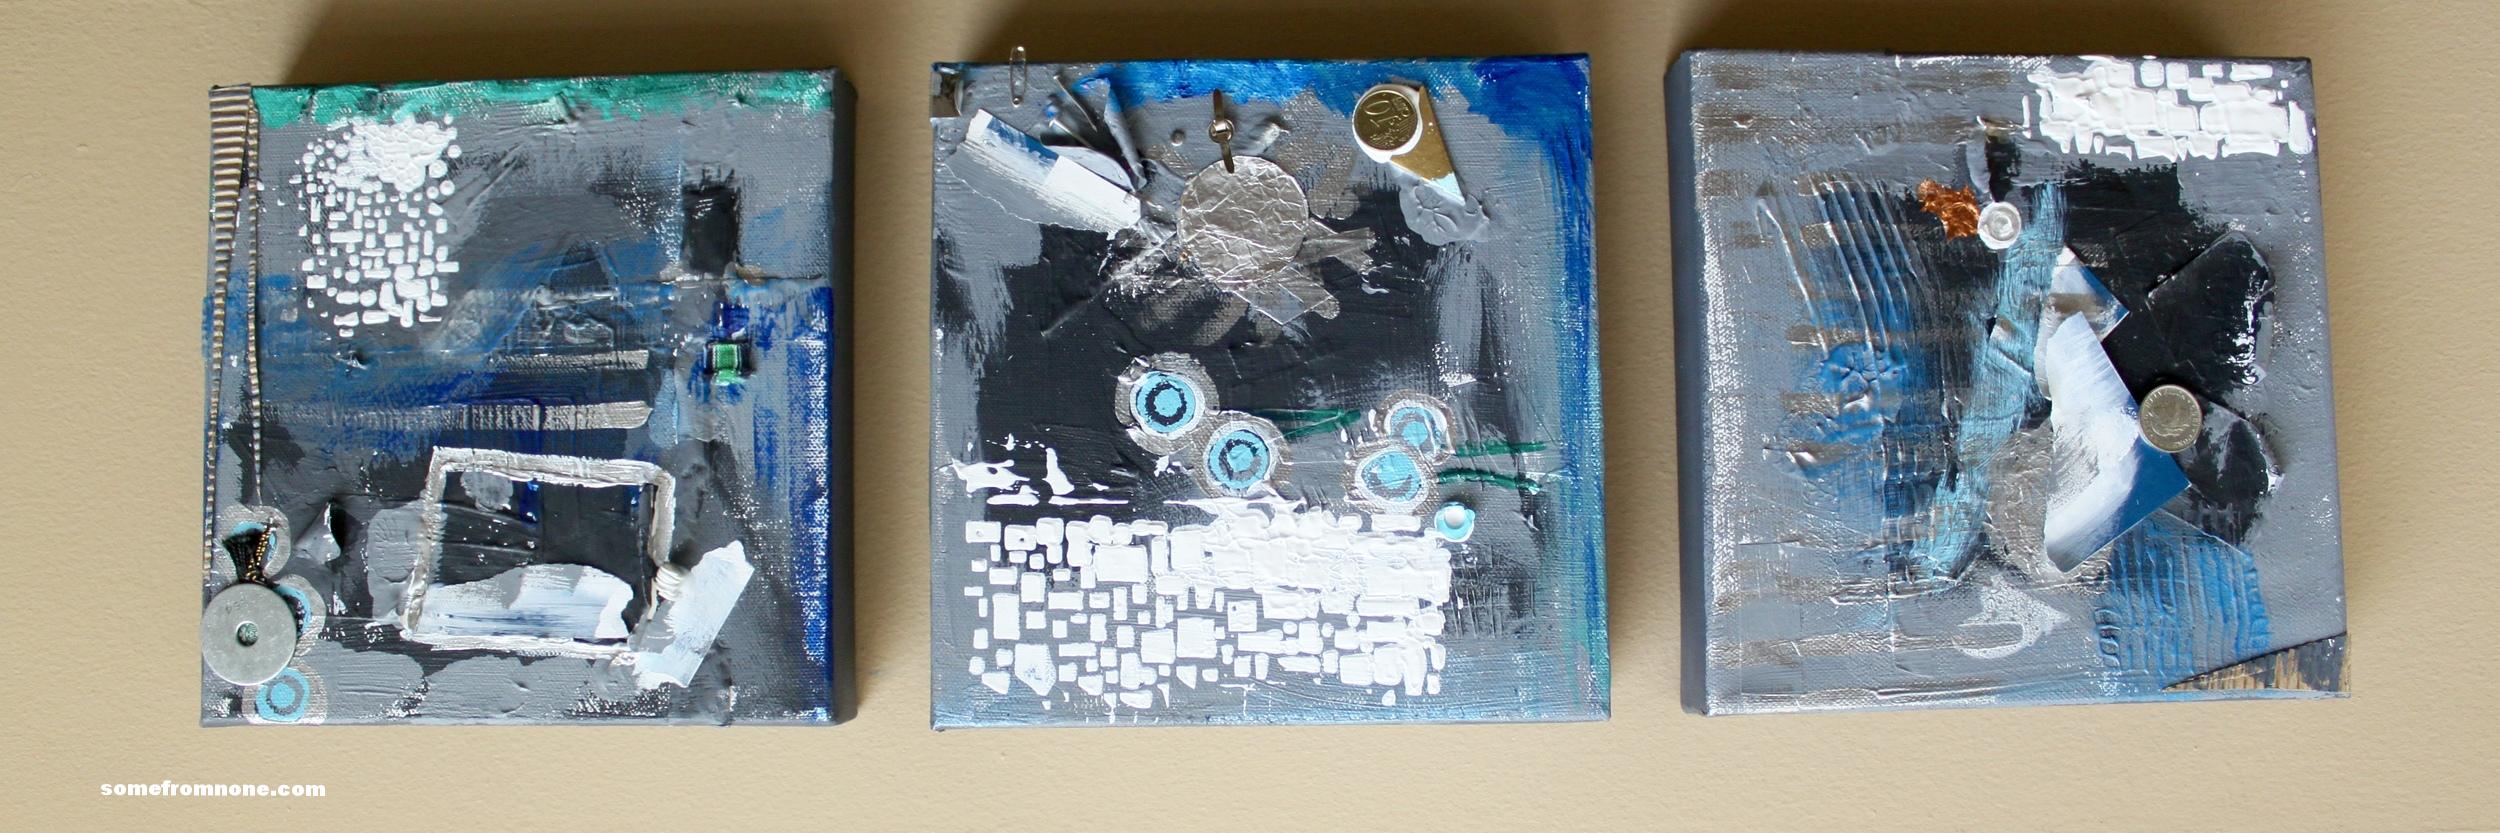 """Throw Away World"" 8"" X *8 Repositionable Art on Canvas"